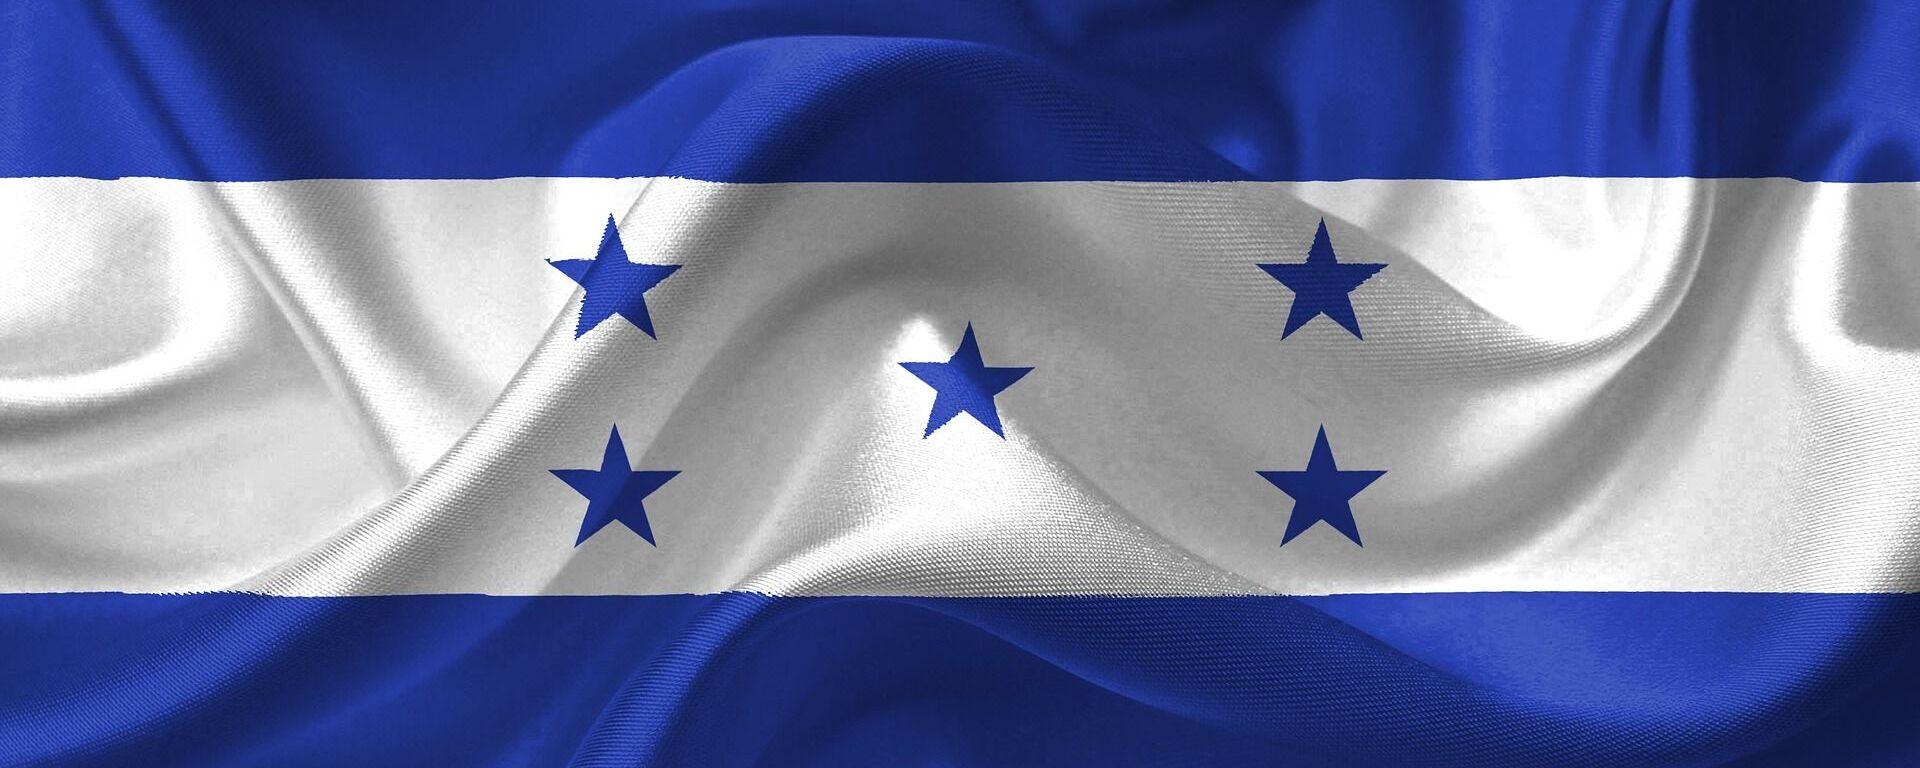 Bandera de Honduras - Sputnik Mundo, 1920, 05.02.2021